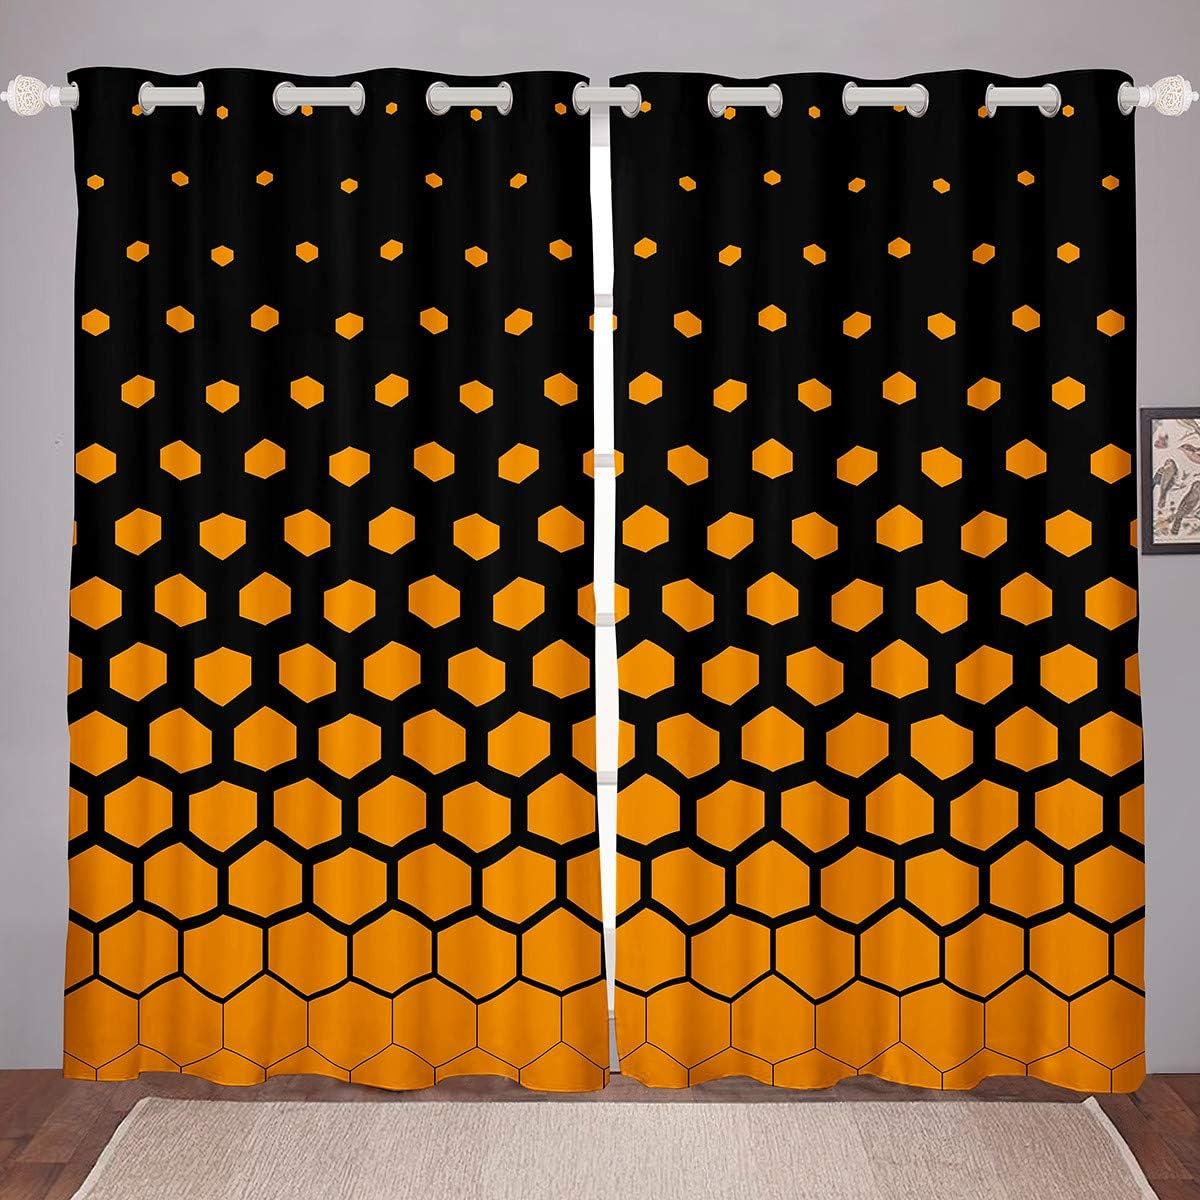 Castle Fairy Yellow Black Background 予約 2020春夏新作 Theme Honeycomb Window Curt